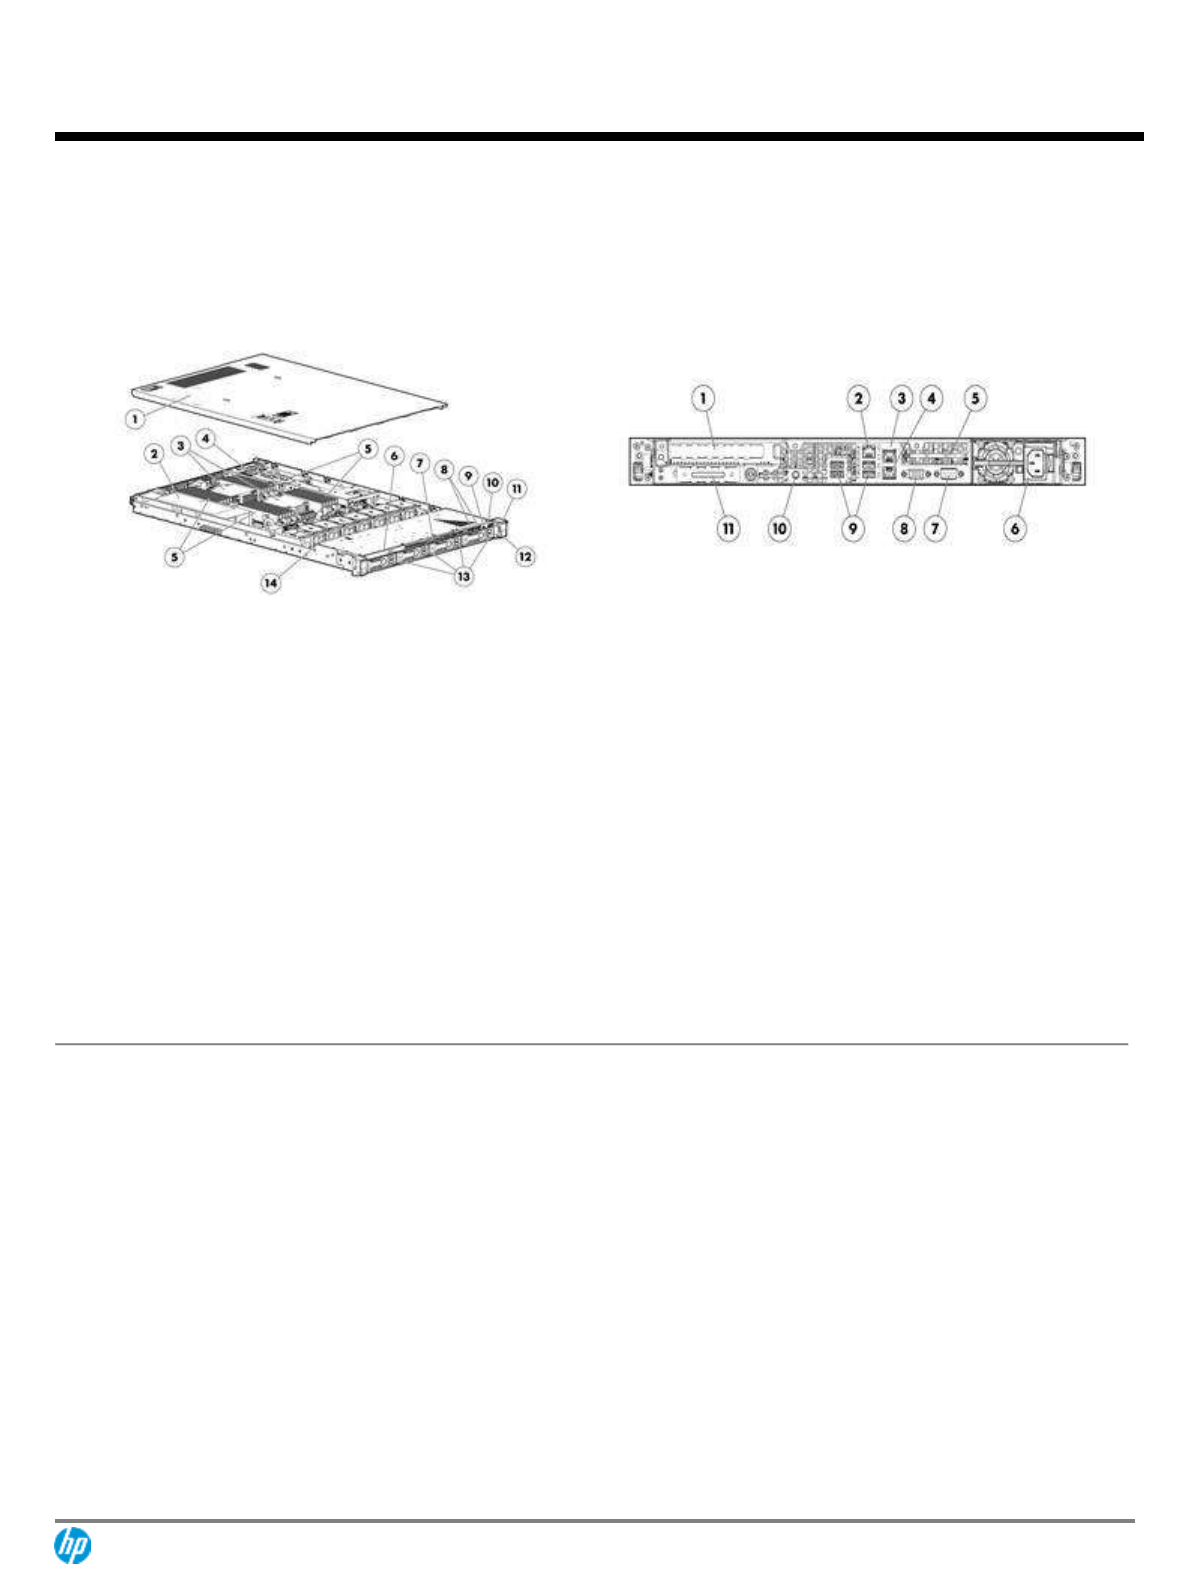 Quickspecs Hp Proliant Dl160 Generation 8 Gen8 Diagram Furthermore Nema L6 30 Wiring On Serial Cable